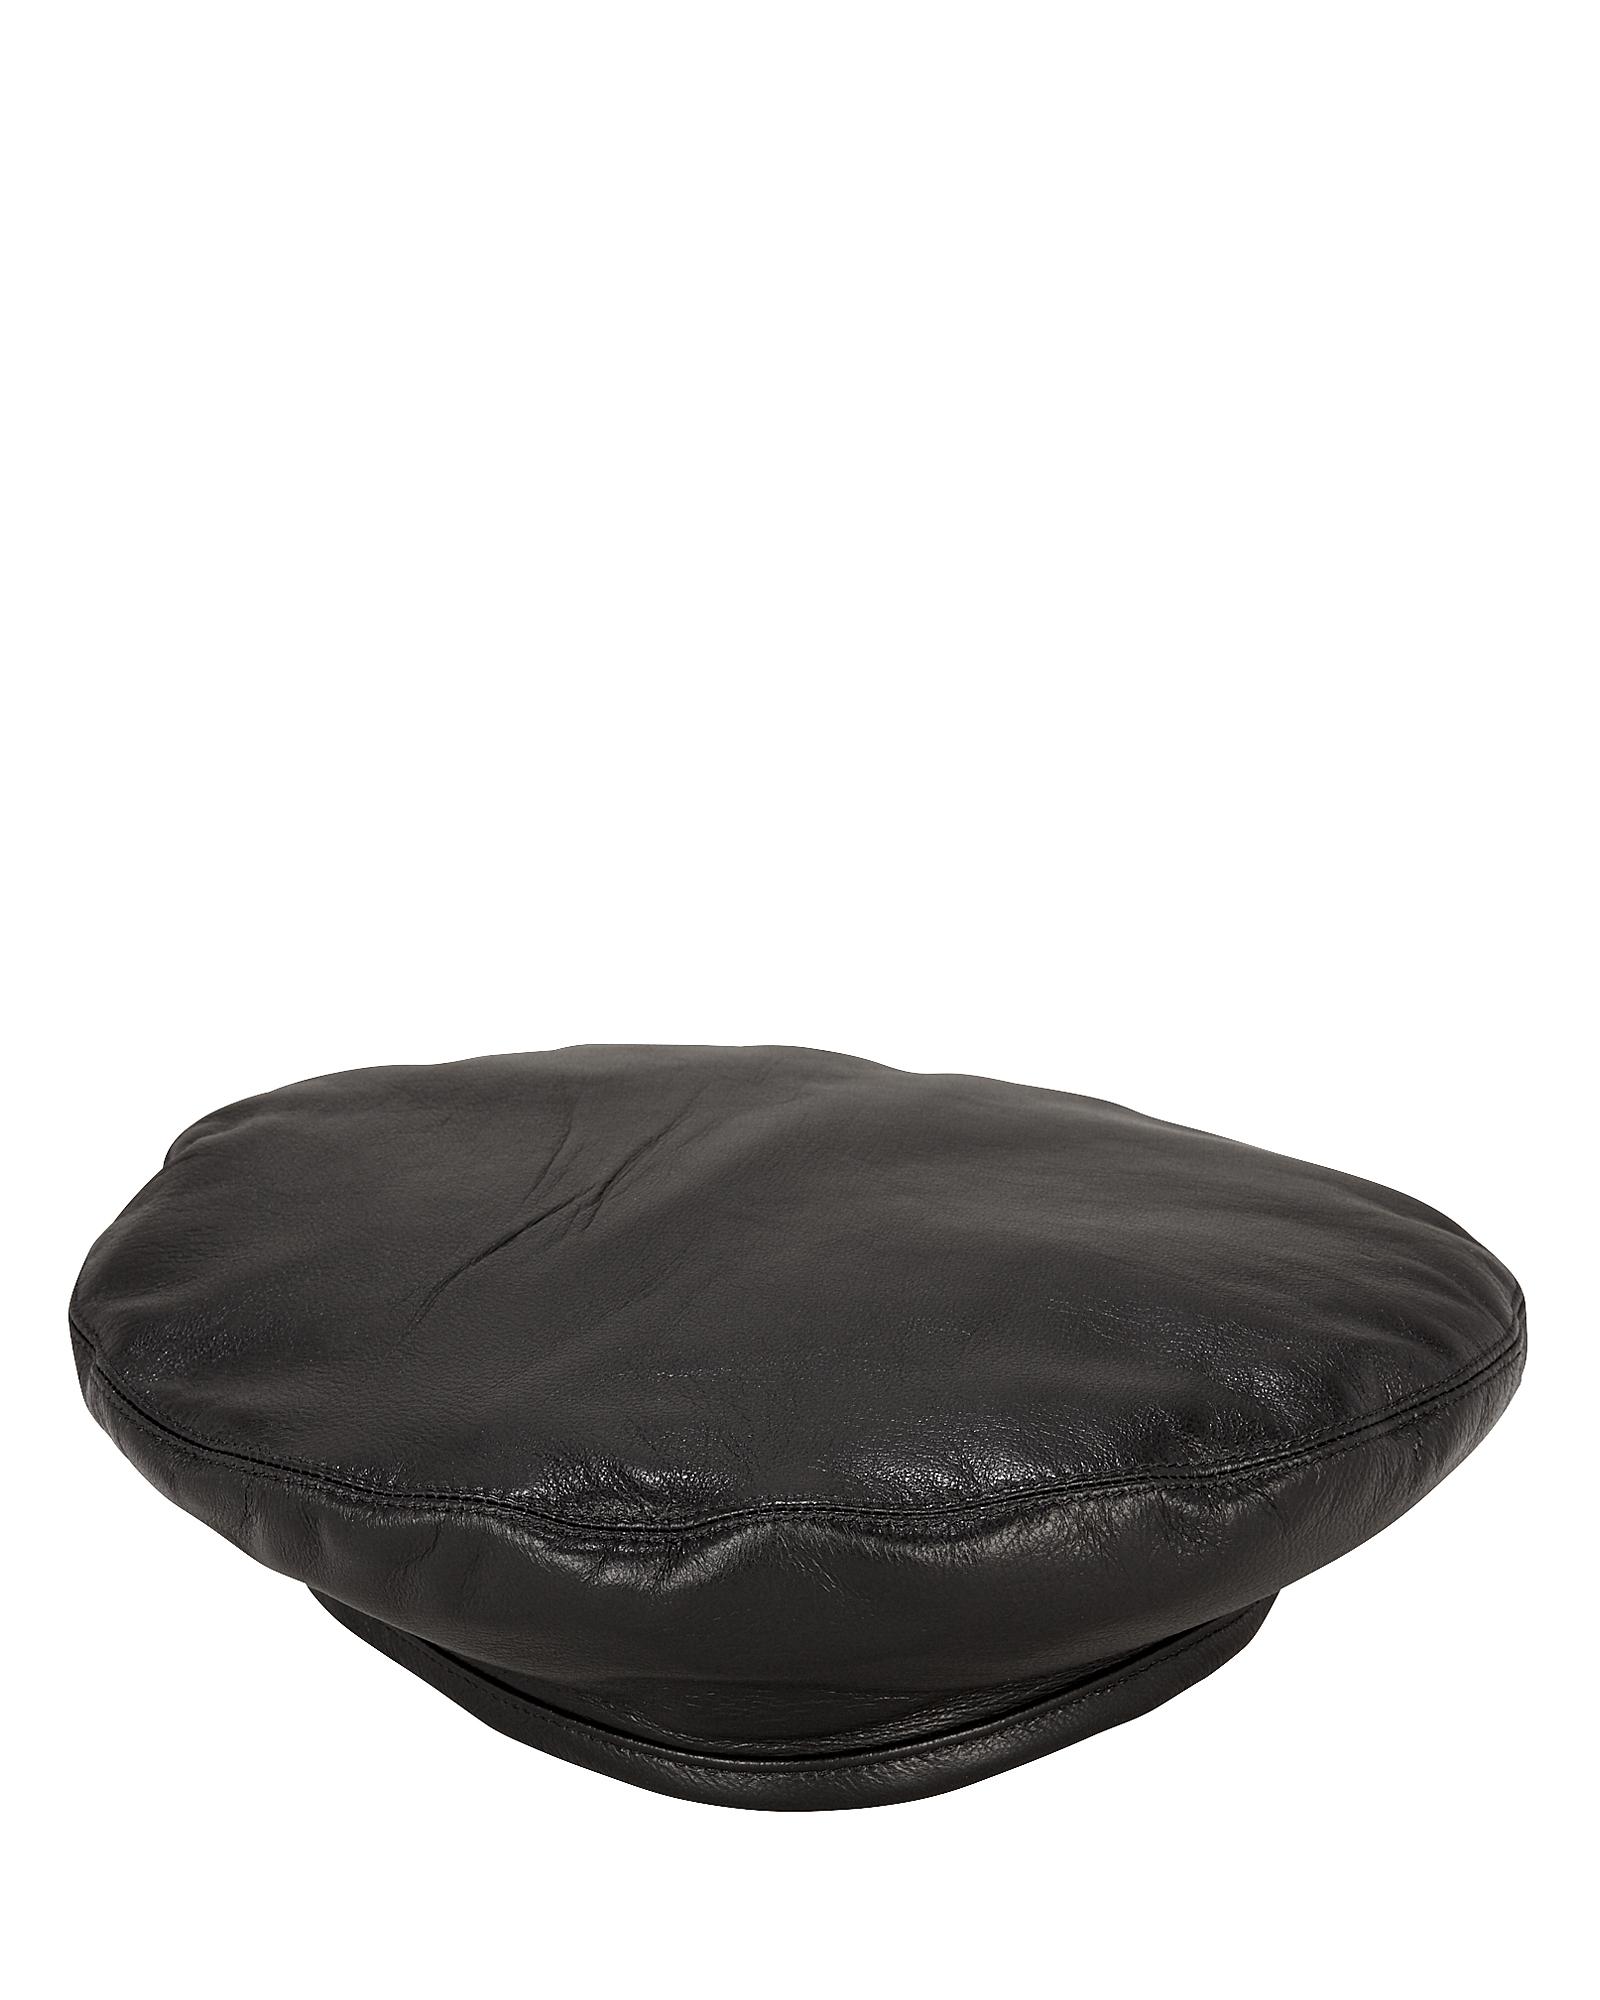 EUGENIA KIM Cher Leather Beret